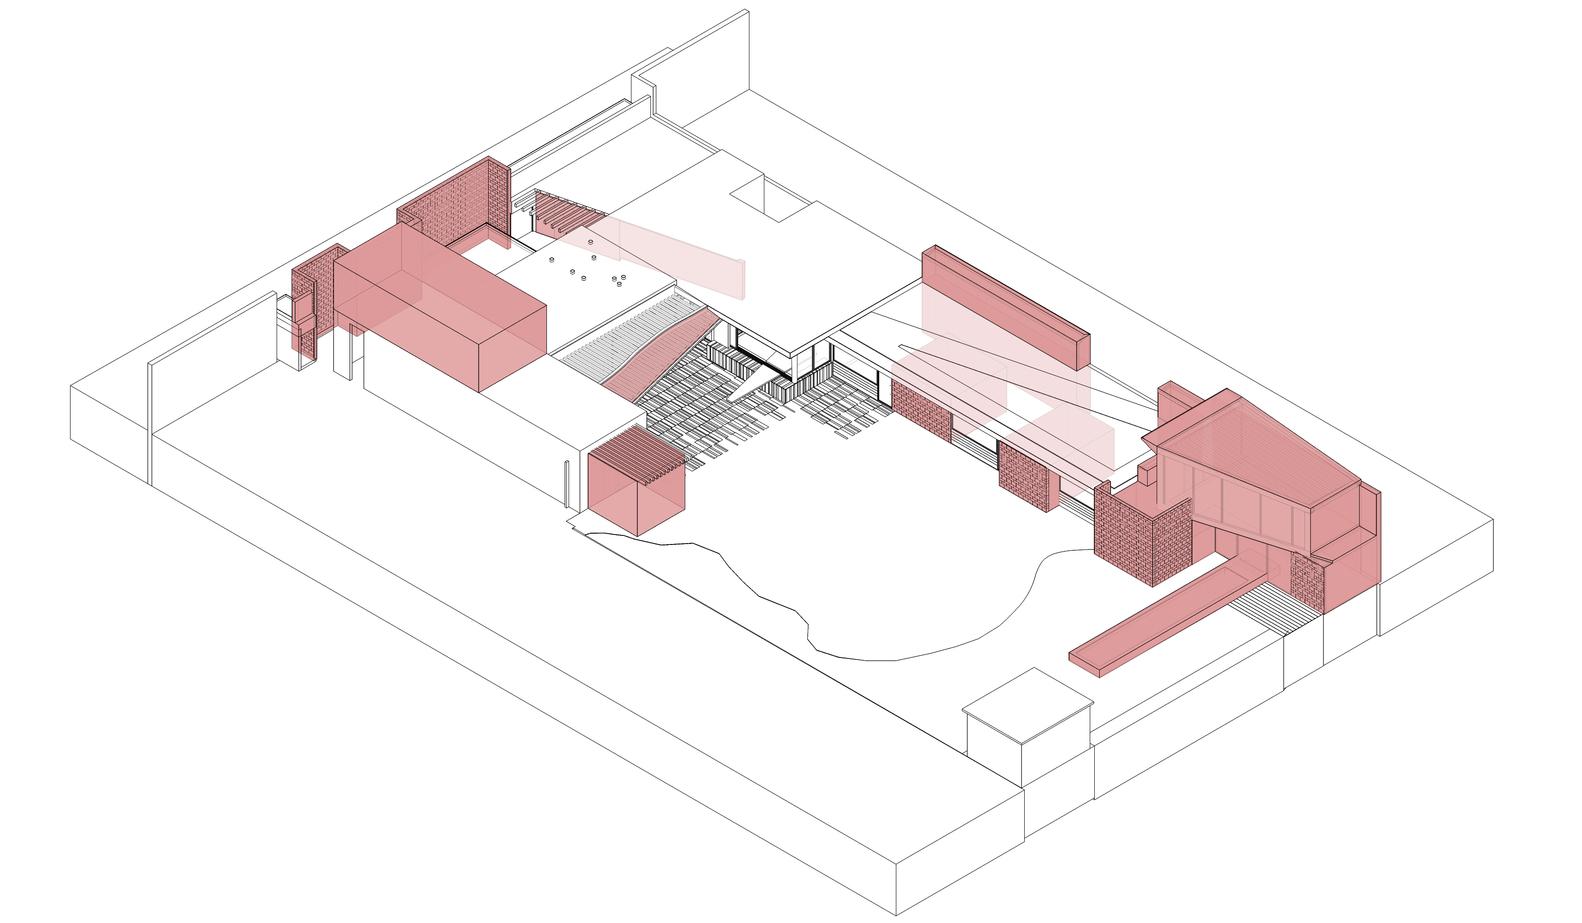 c260 house hda h ctor del mar arquitectura diagram [ 1582 x 923 Pixel ]